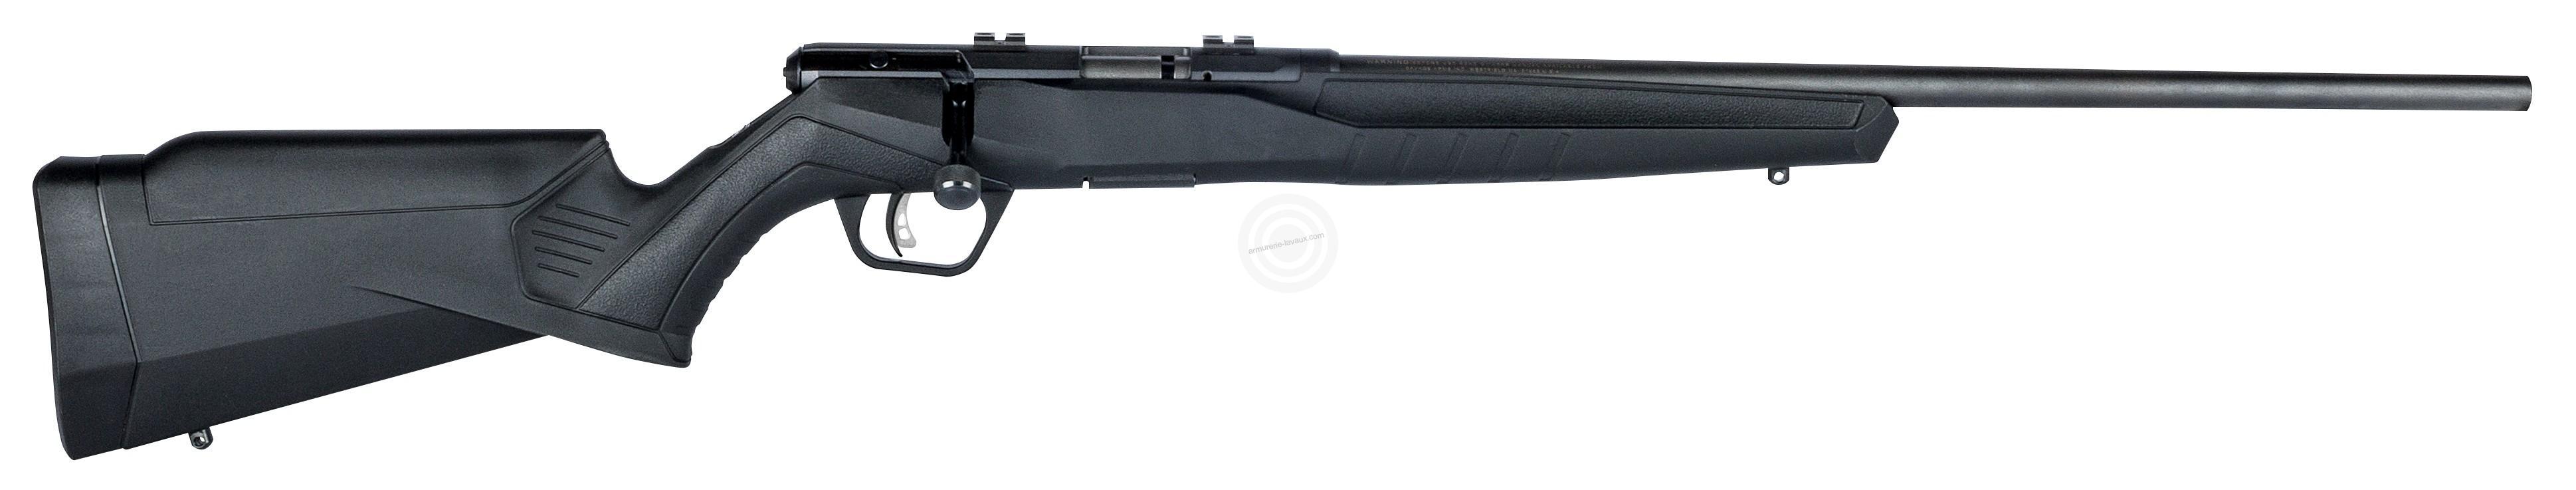 Carabine 22LR SAVAGE Series B22FV